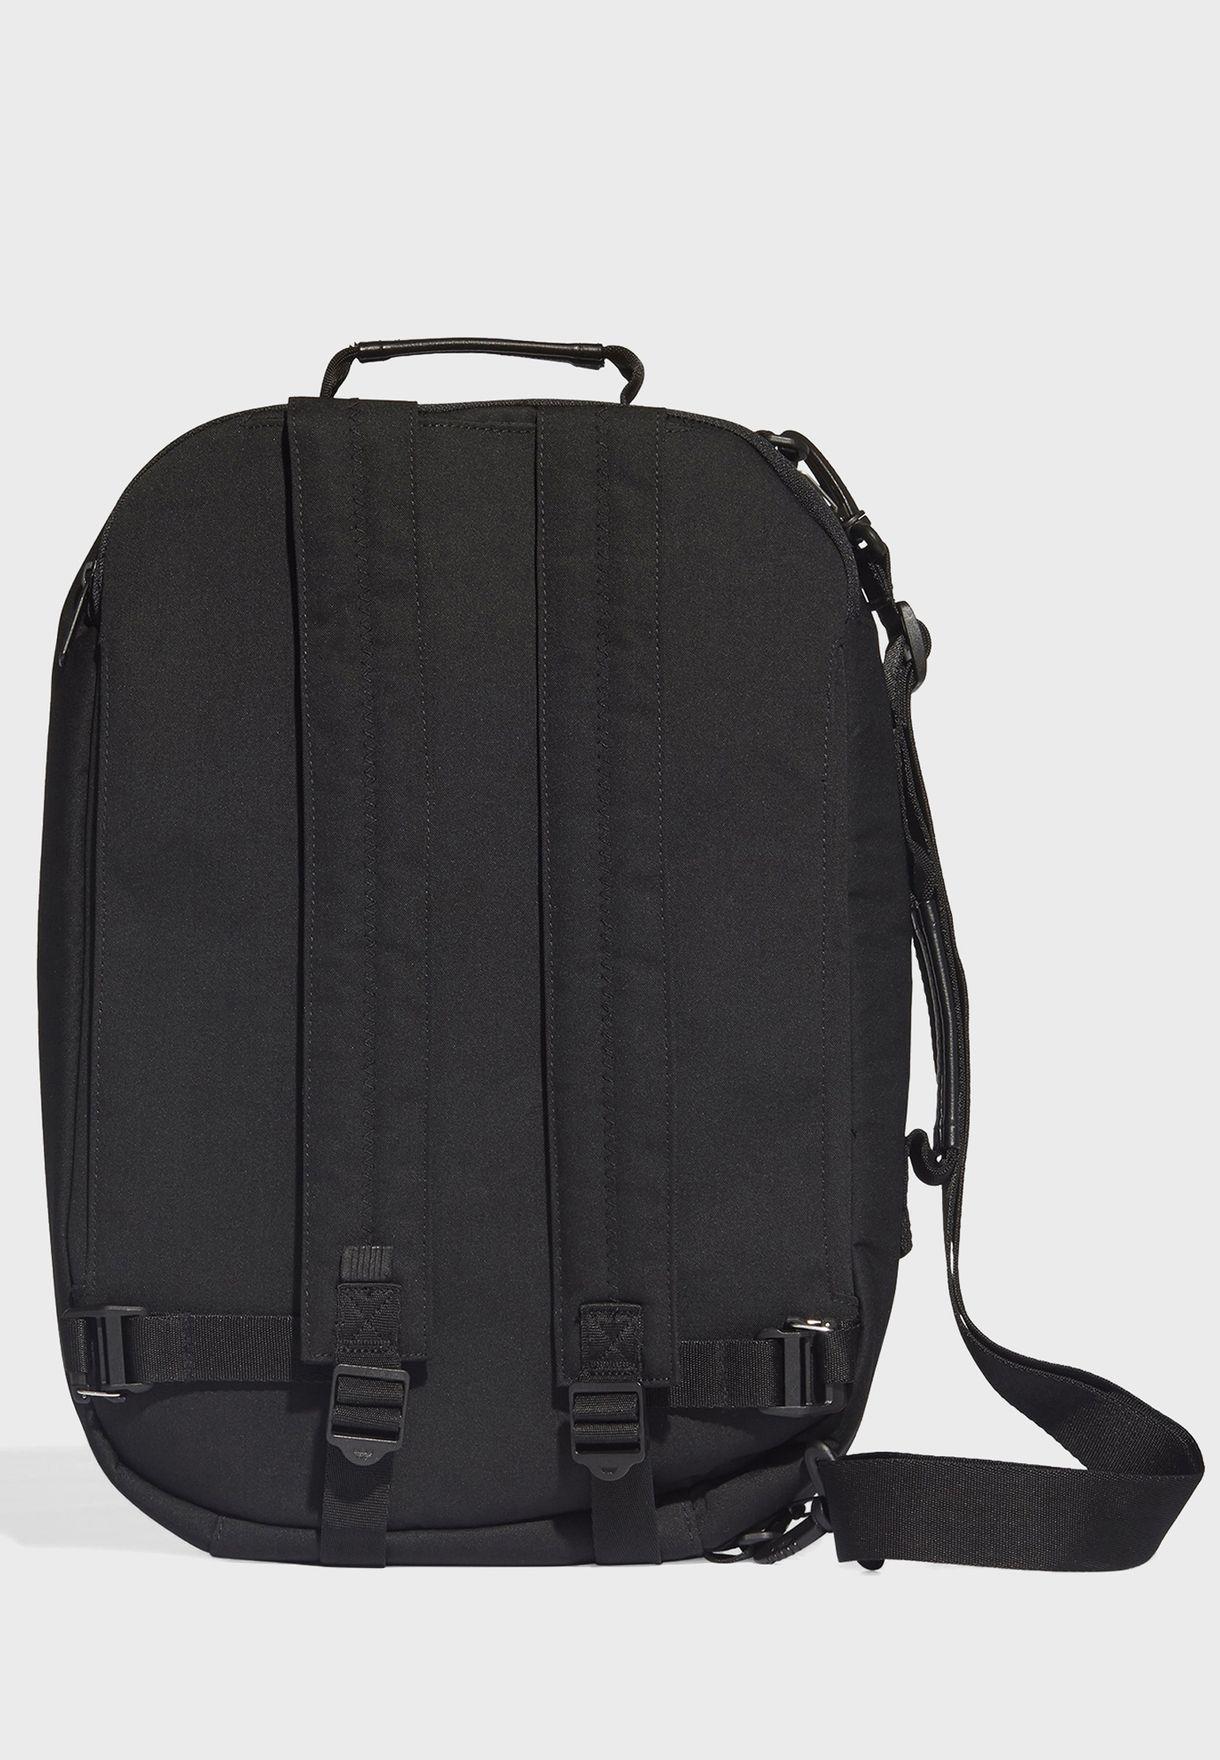 Archive Modern Airliner Backpack